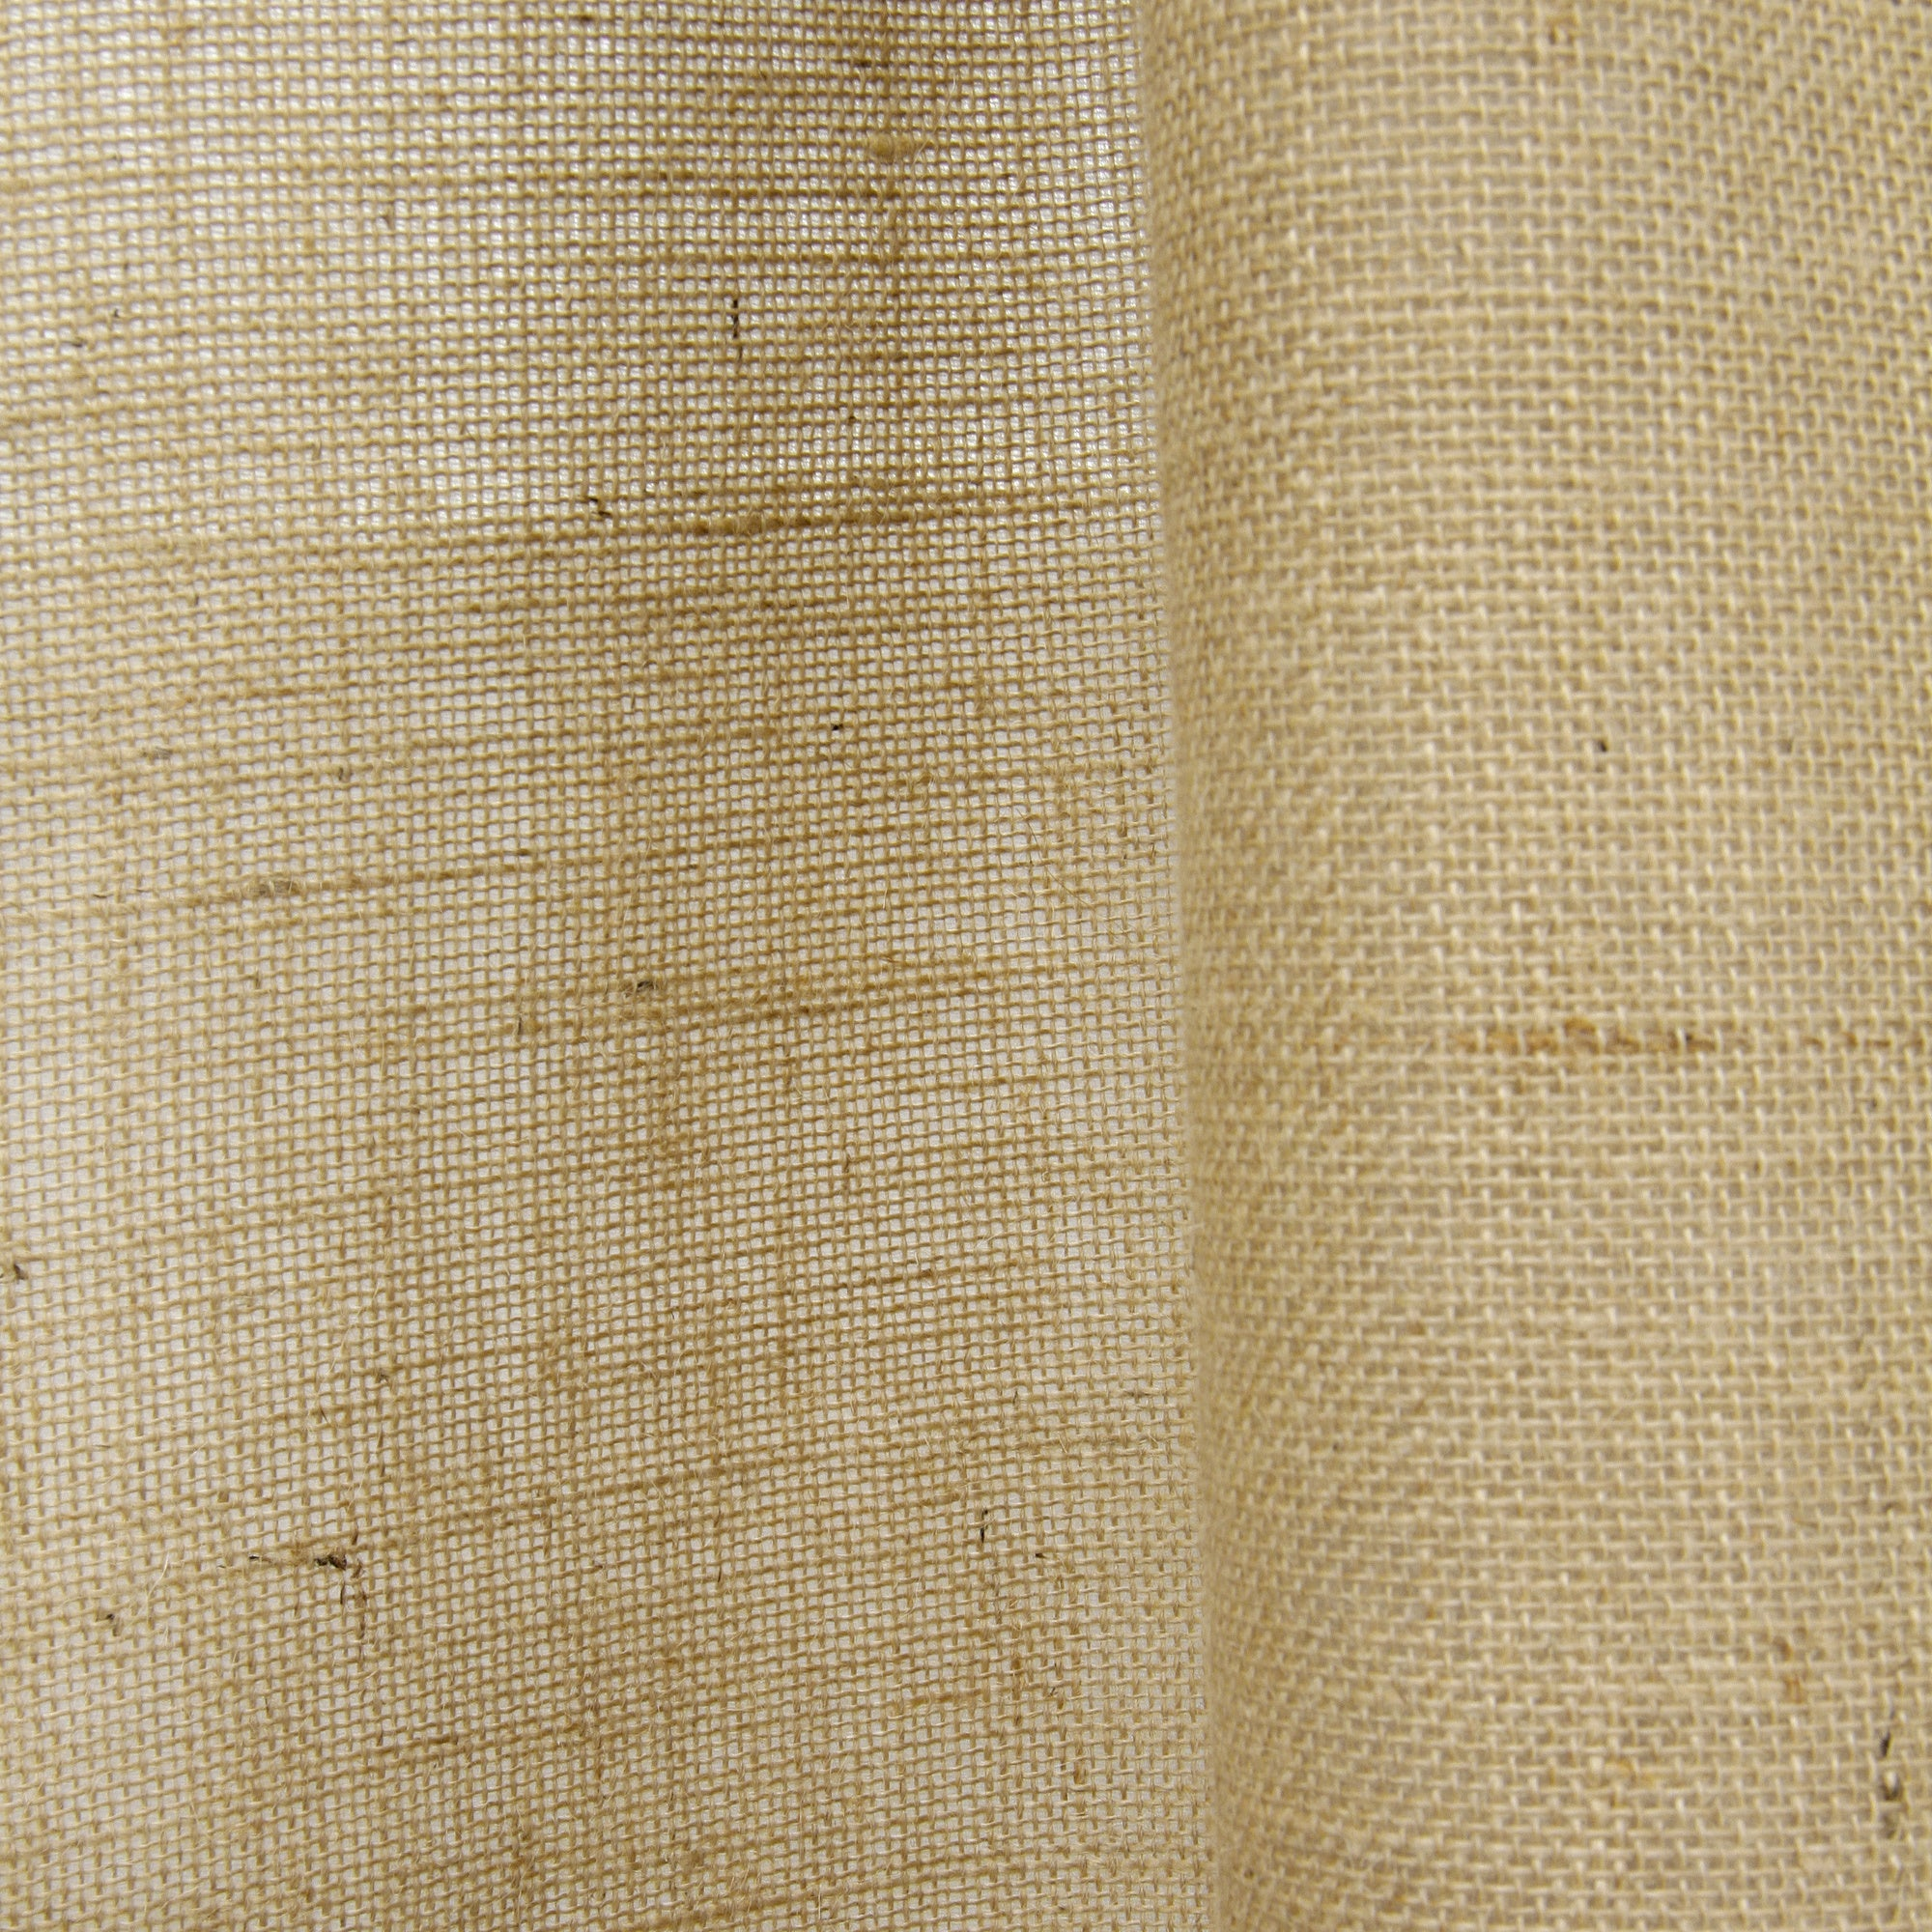 Open Weave Lined Burlap Curtain Panel Ebay